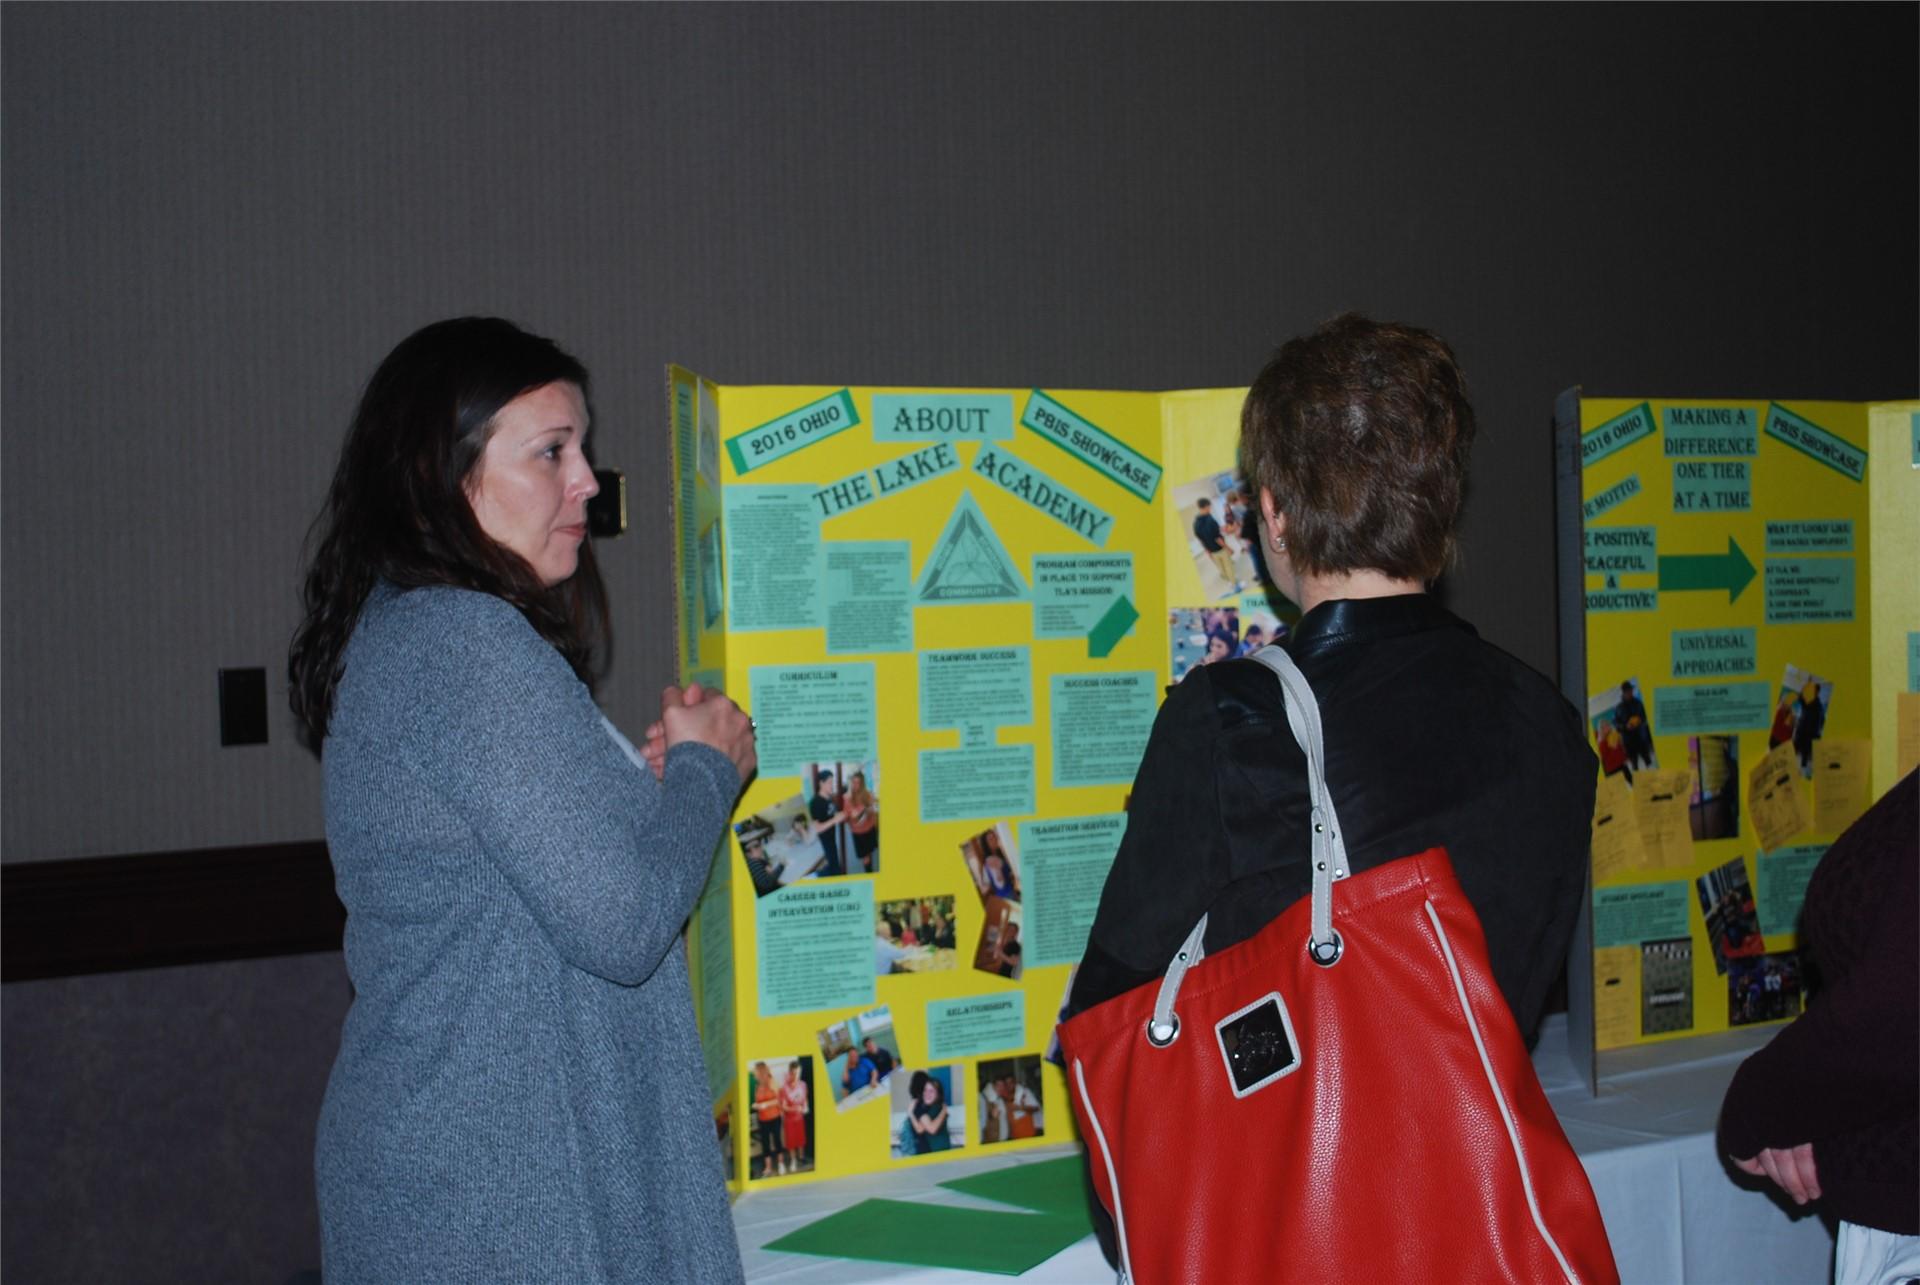 Shari Pfeiffer presenting about The Lake Academy Alternative School